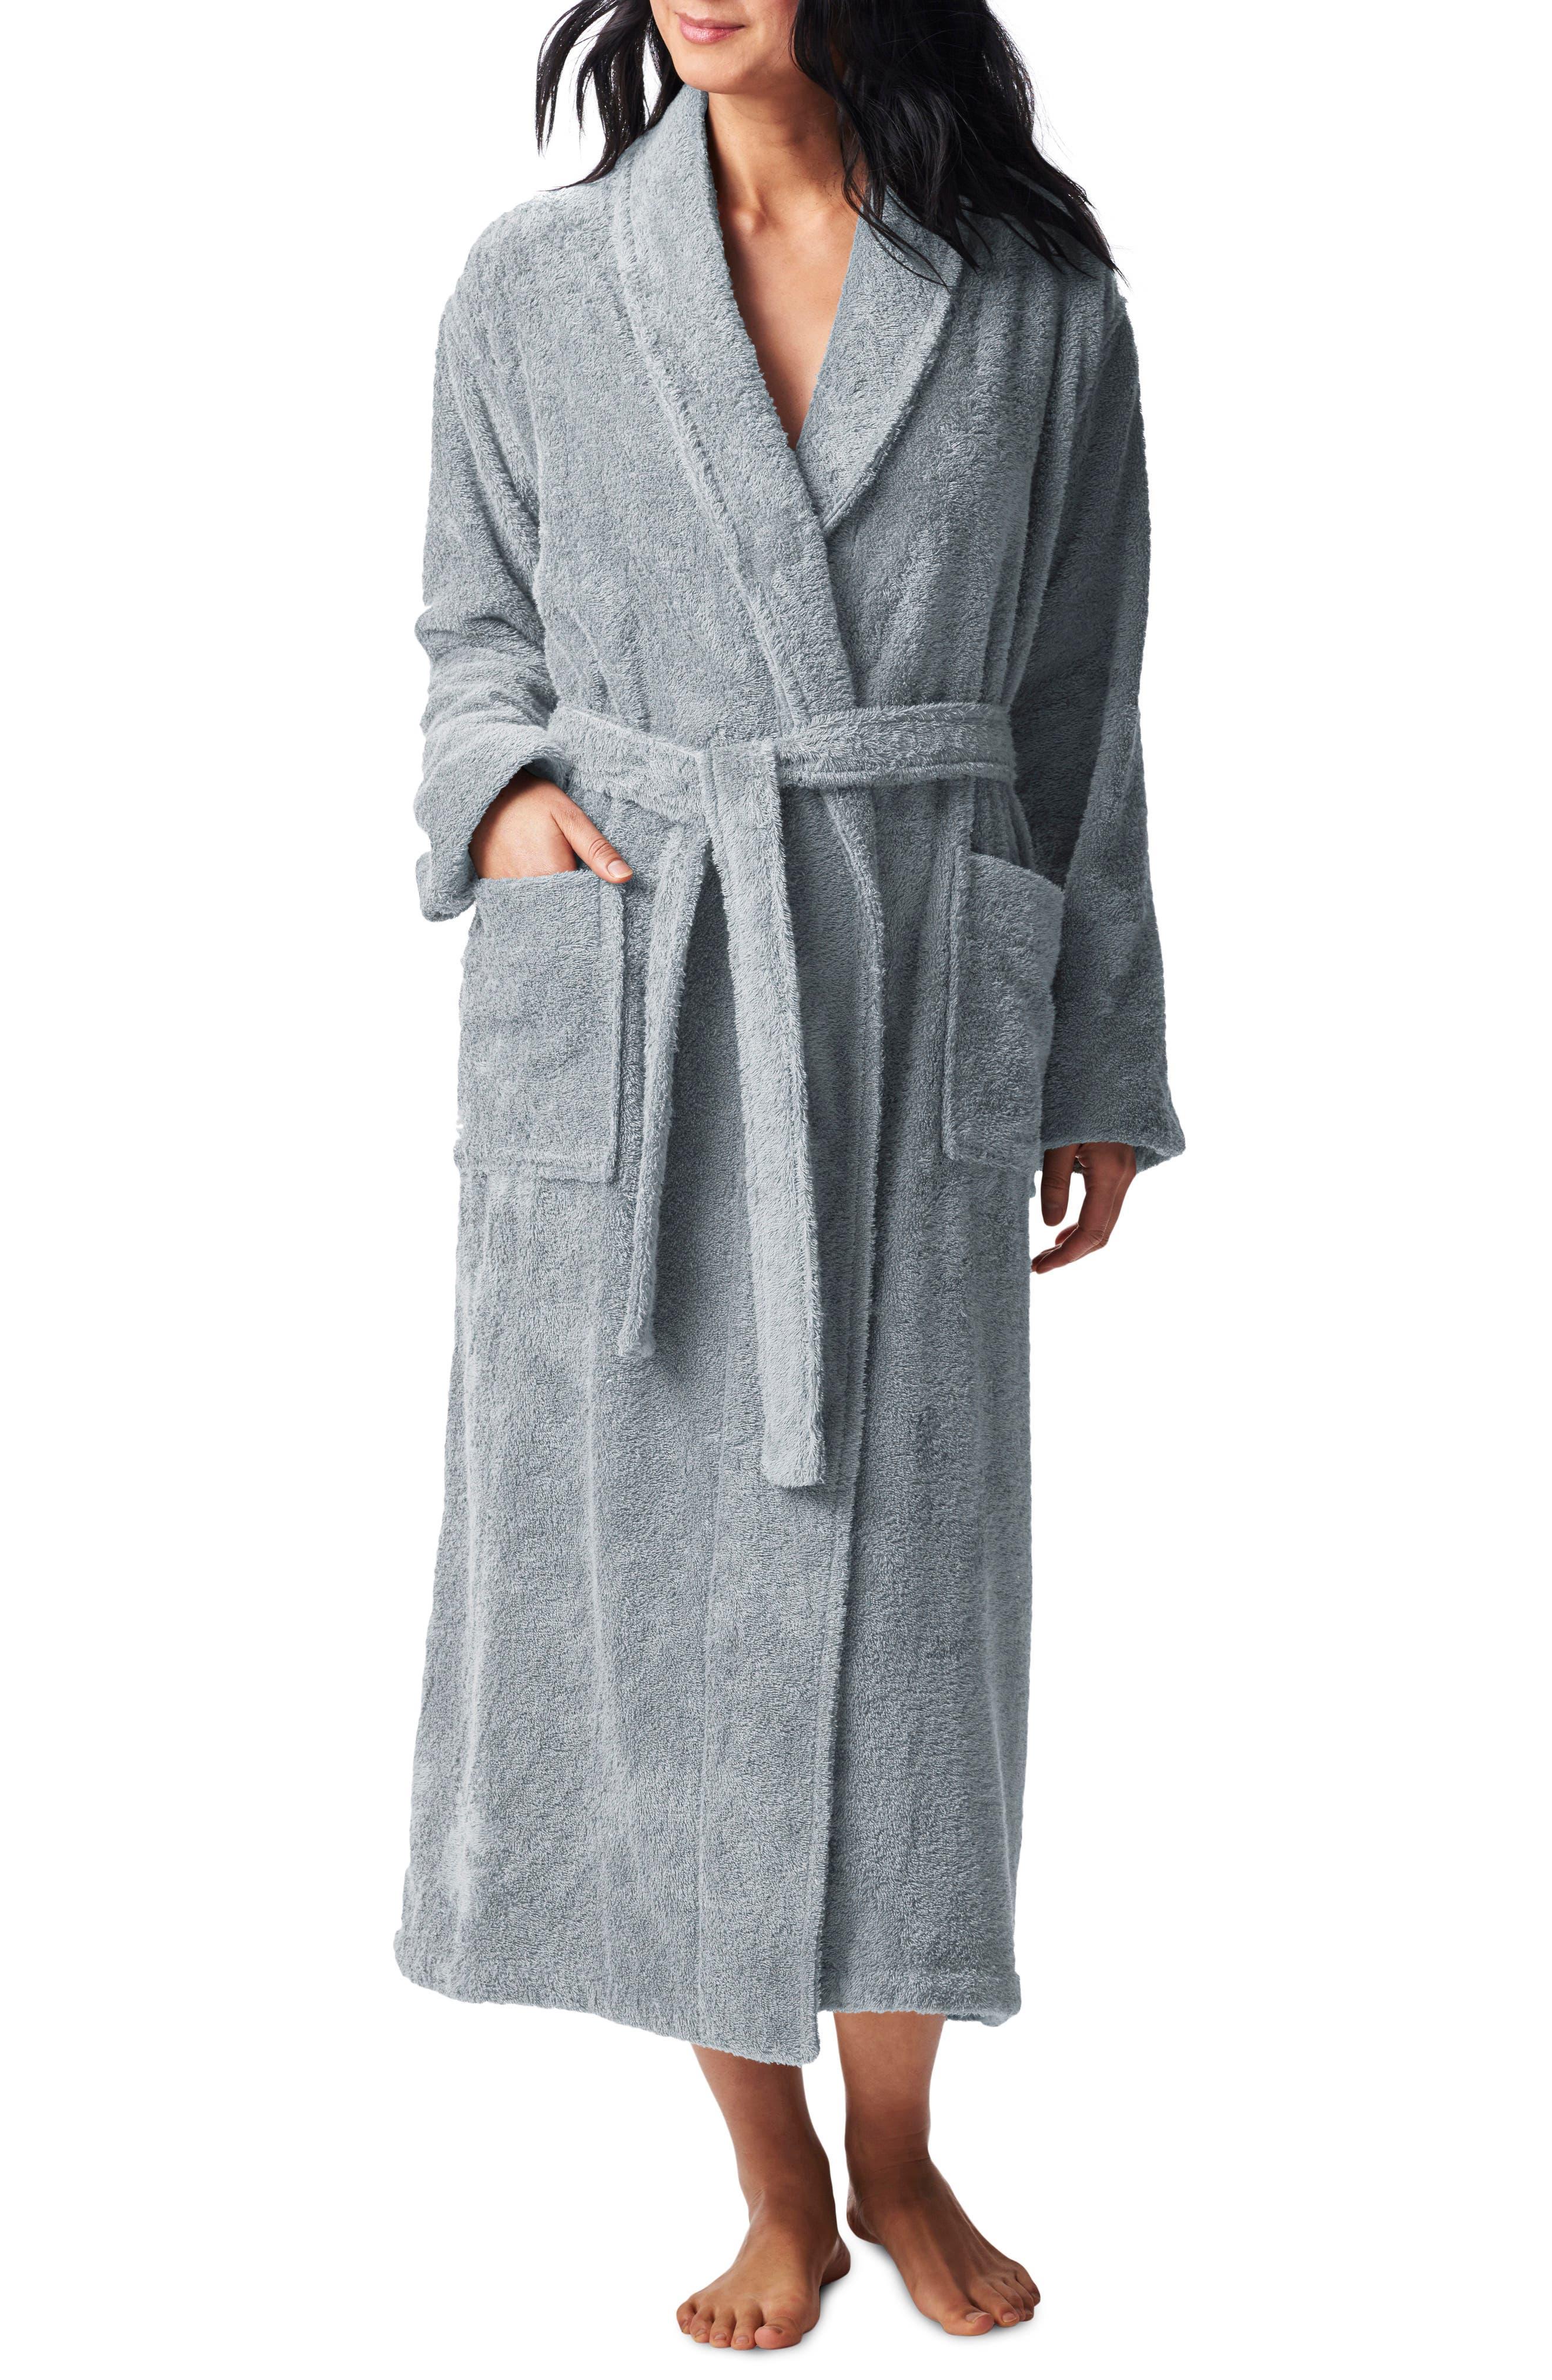 Cloud Loom(TM) Unisex Organic Cotton Robe